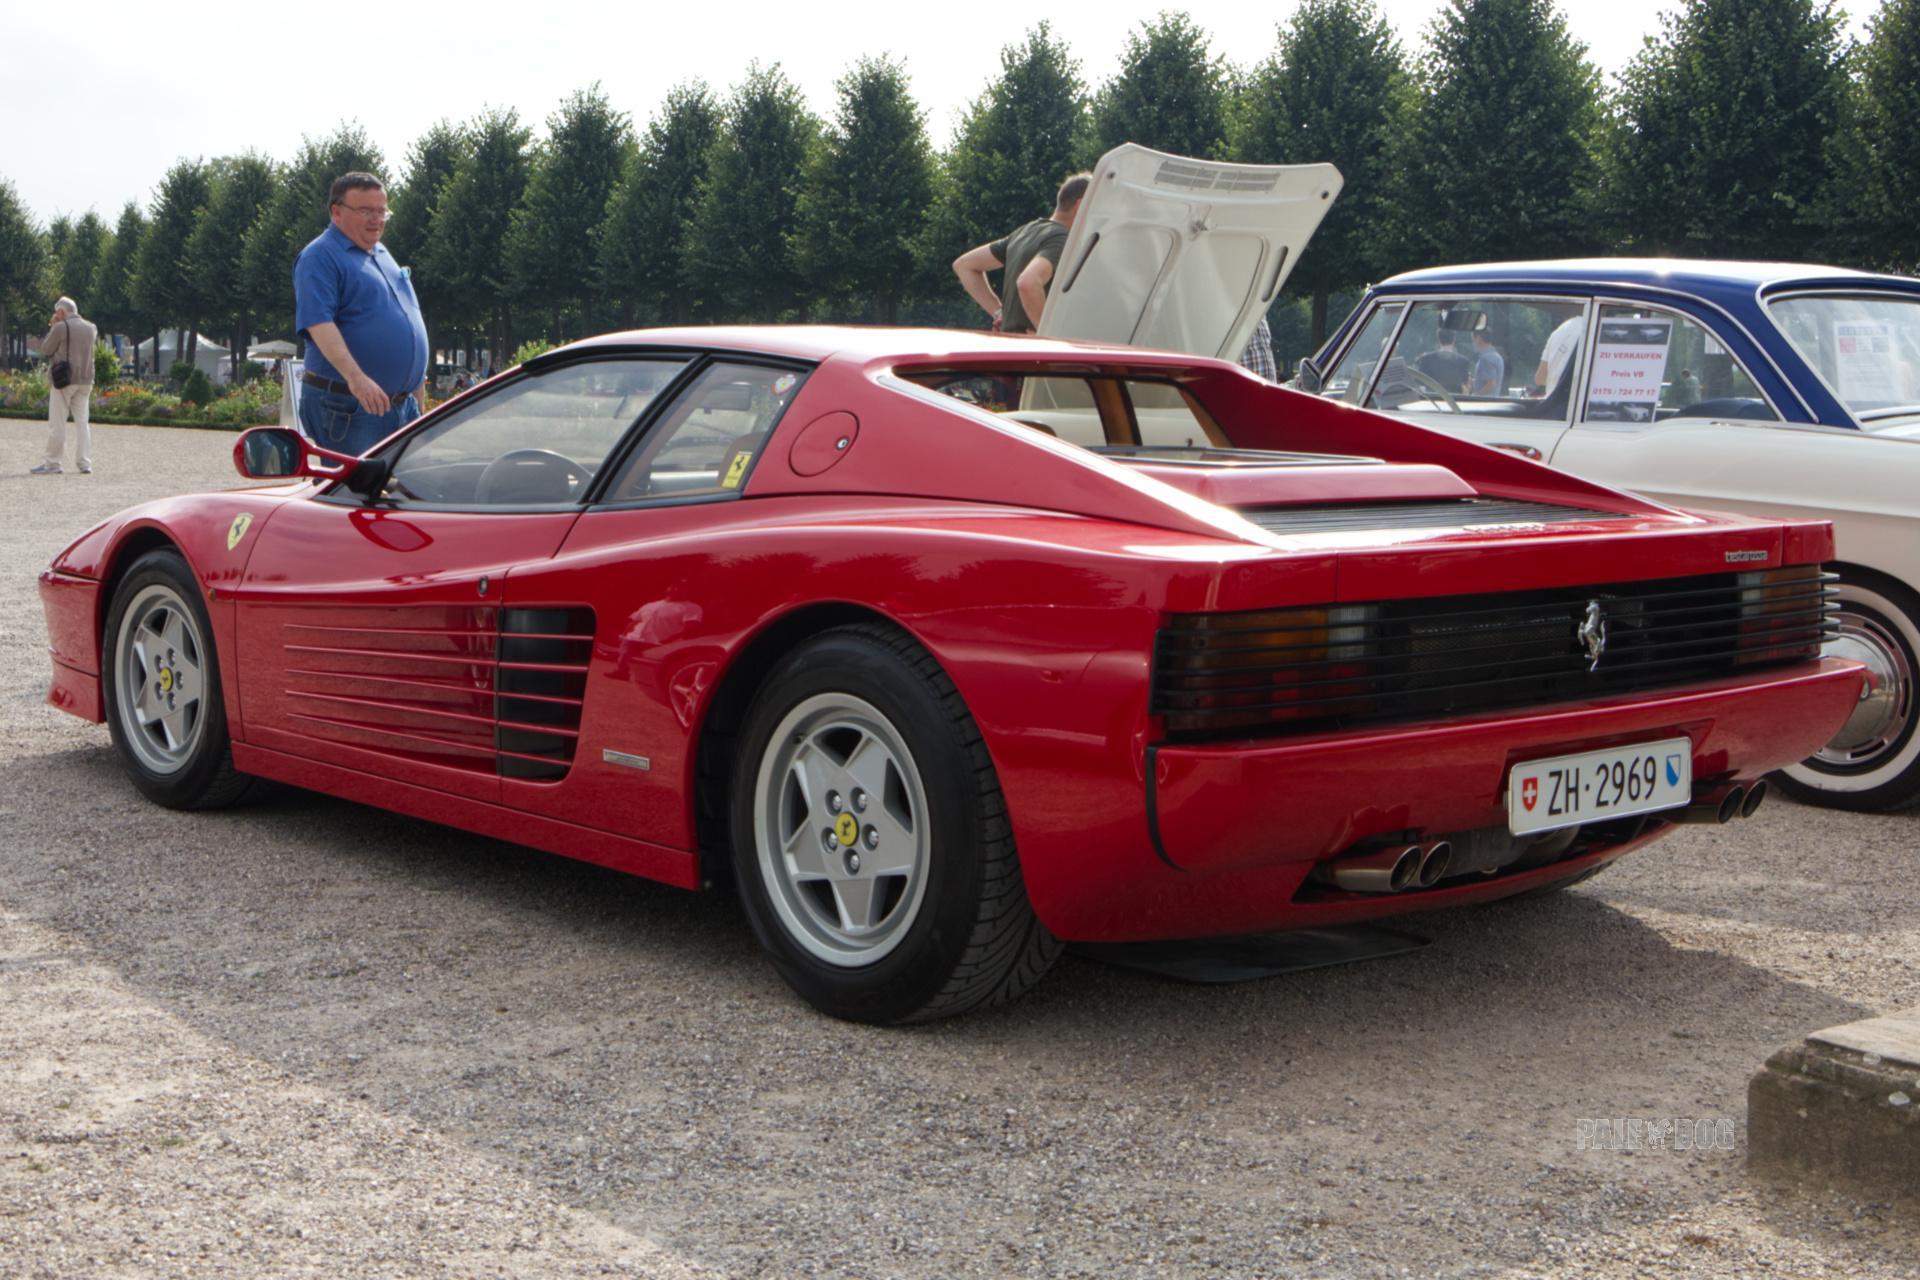 1989 Ferrari Testarossa Rear View 1980s Paledog Photo Collection